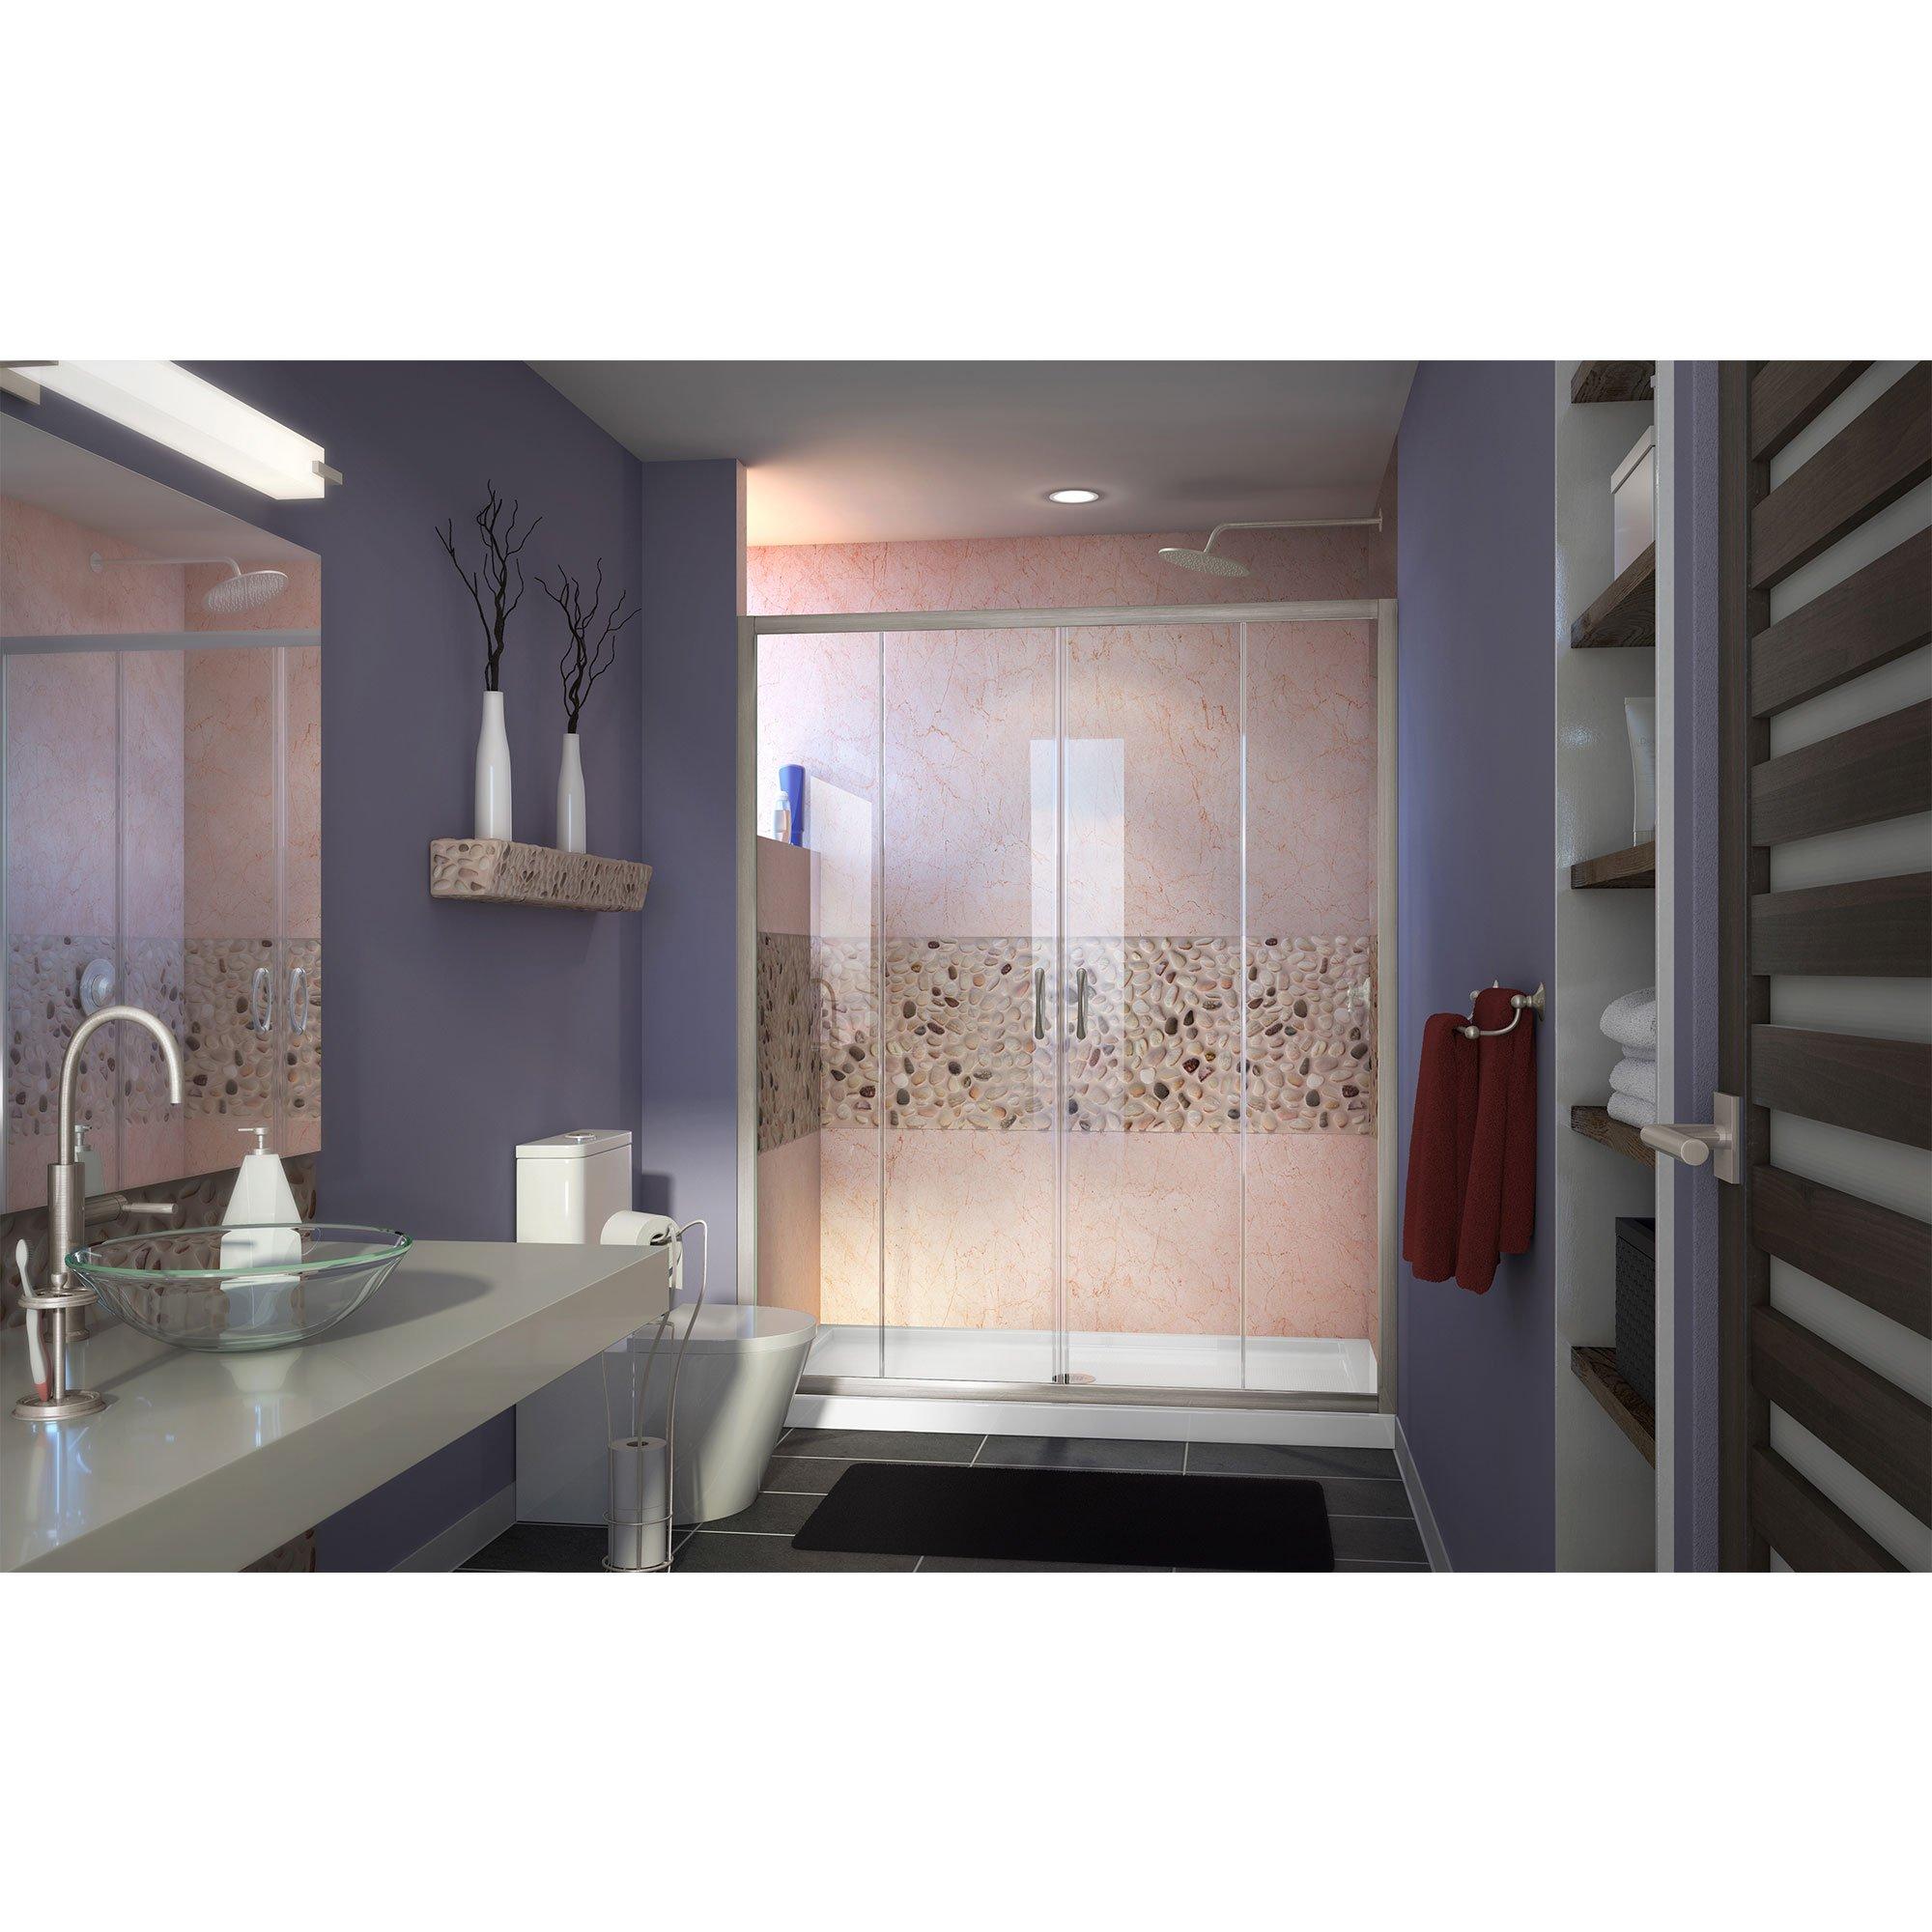 DreamLine Visions 56-60 in. Width, Frameless Sliding Shower Door, 1/4'' Glass, Brushed Nickel Finish by DreamLine (Image #4)